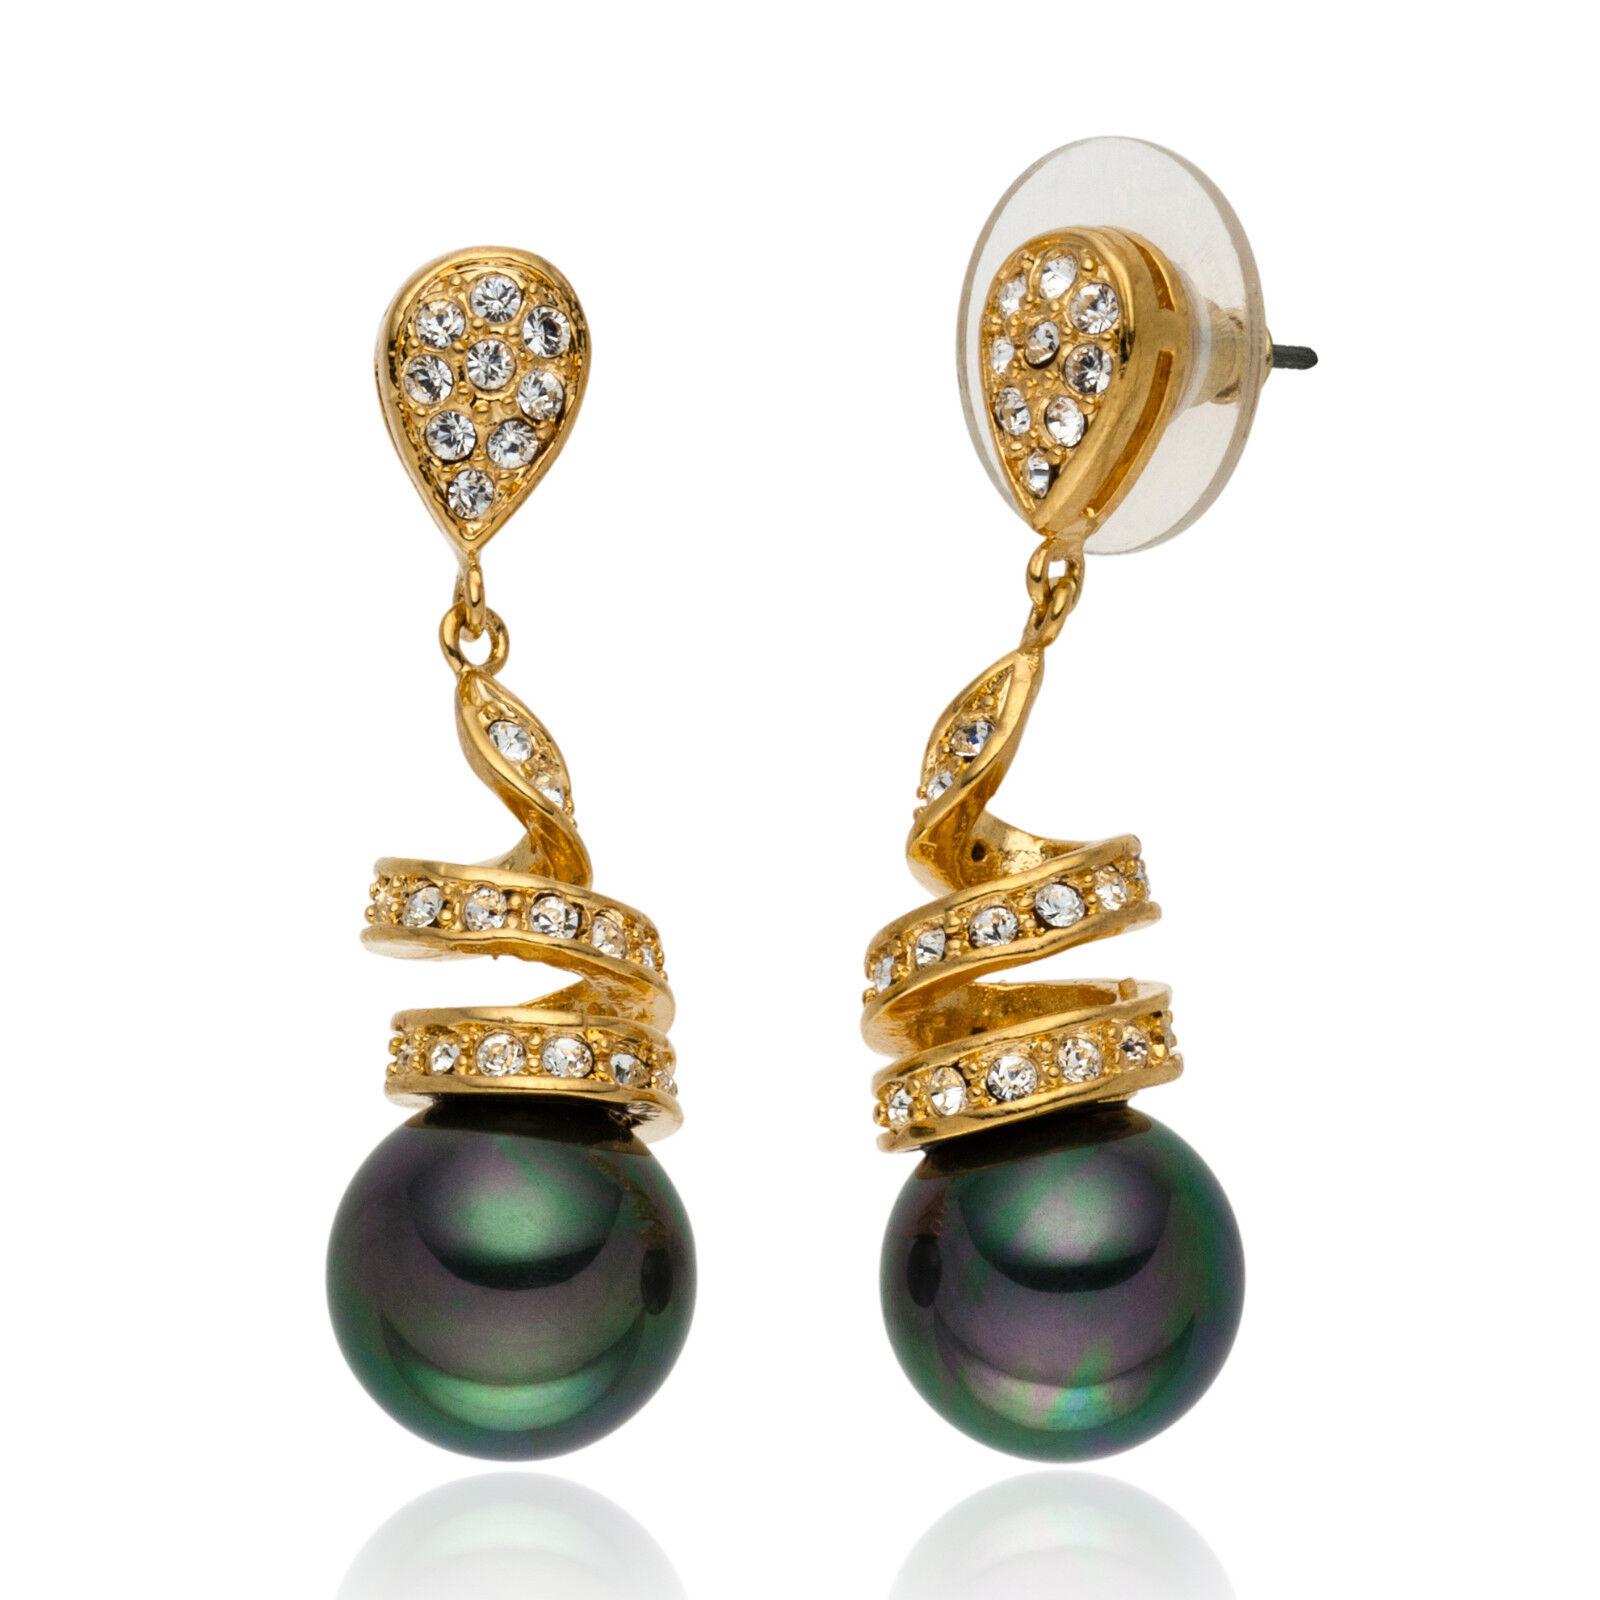 LUXURY tahiti green Shell core Pearl Earrings Yellow gold plated (FO19)